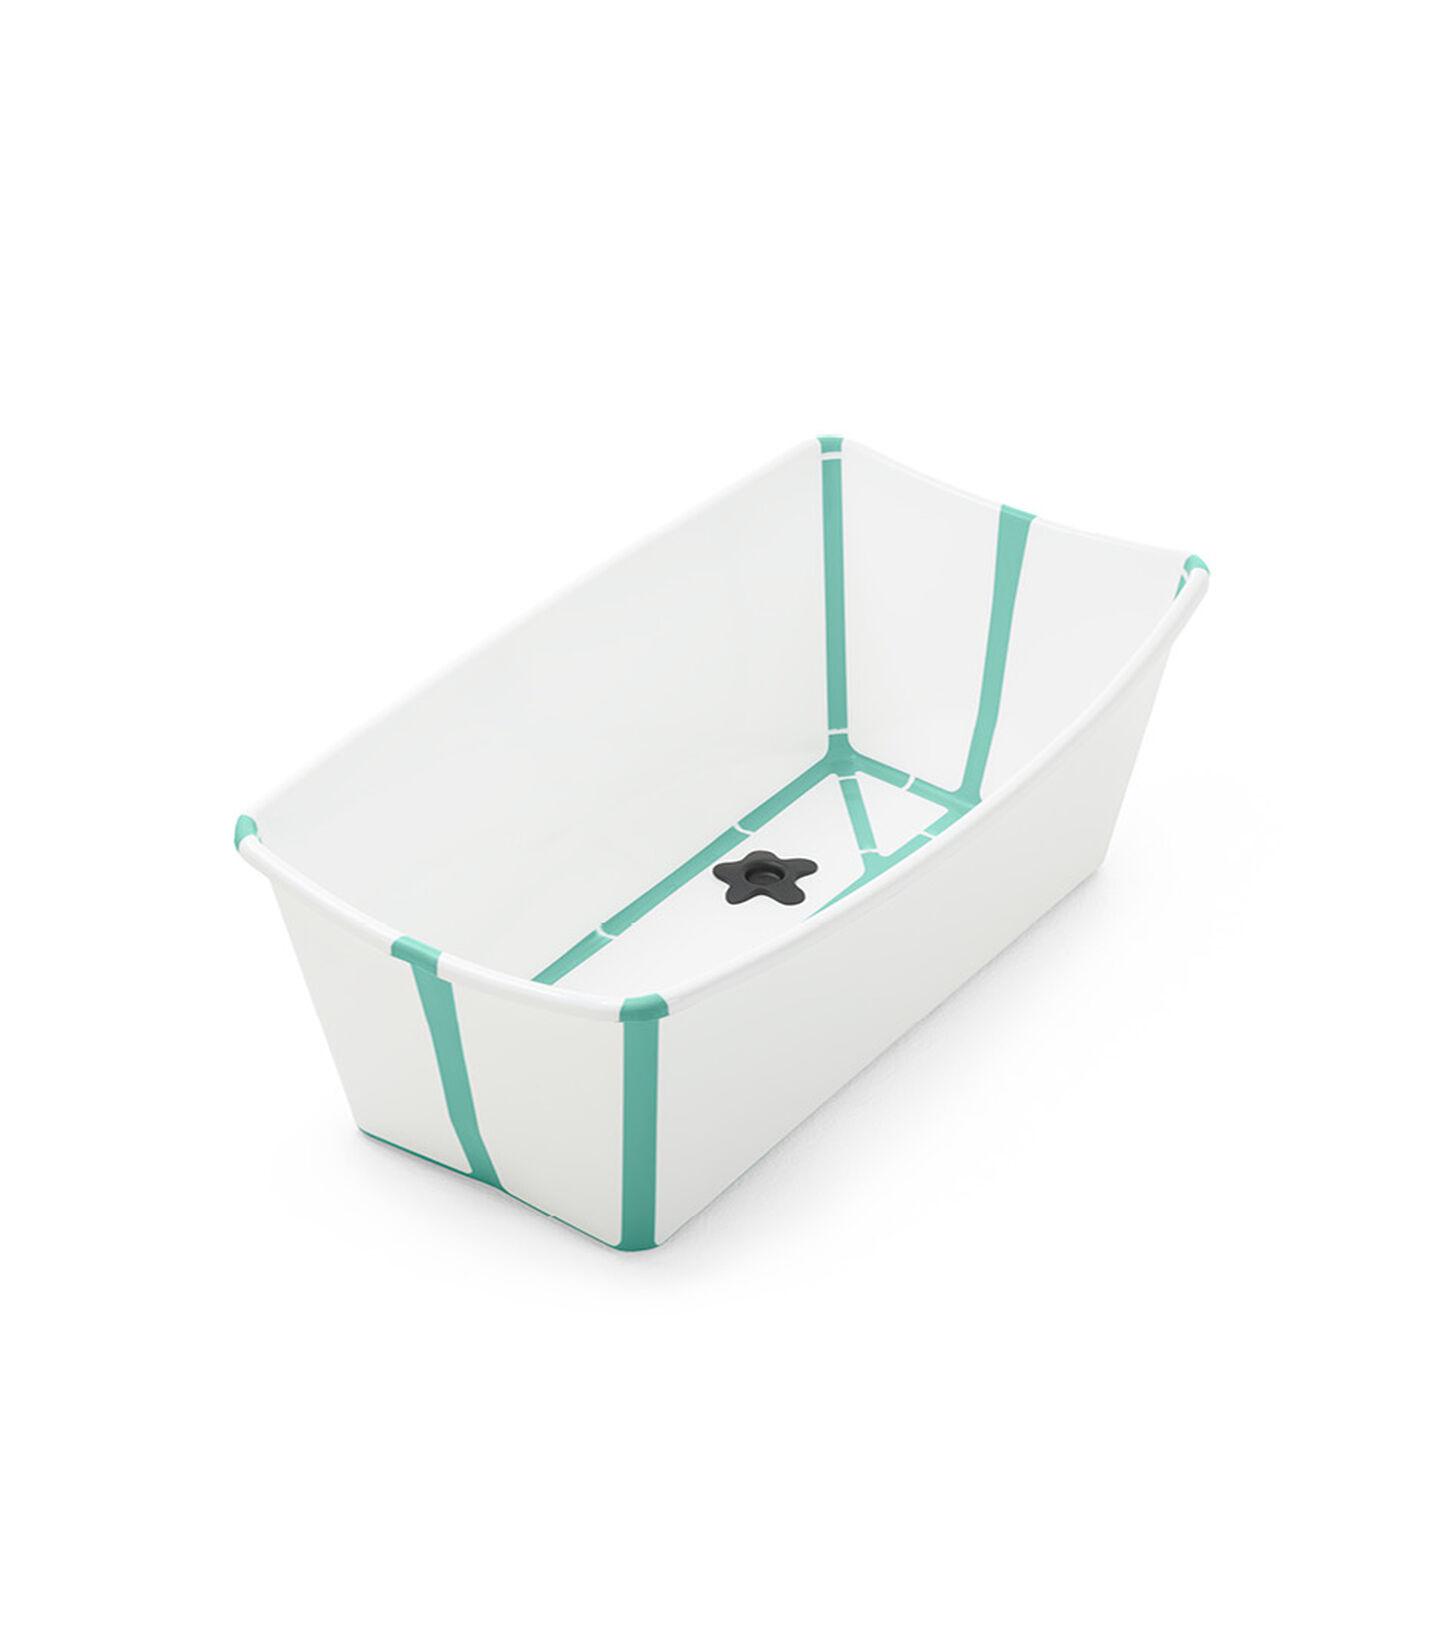 Stokke® Flexi Bath® bath tub, White Aqua. Open. view 2